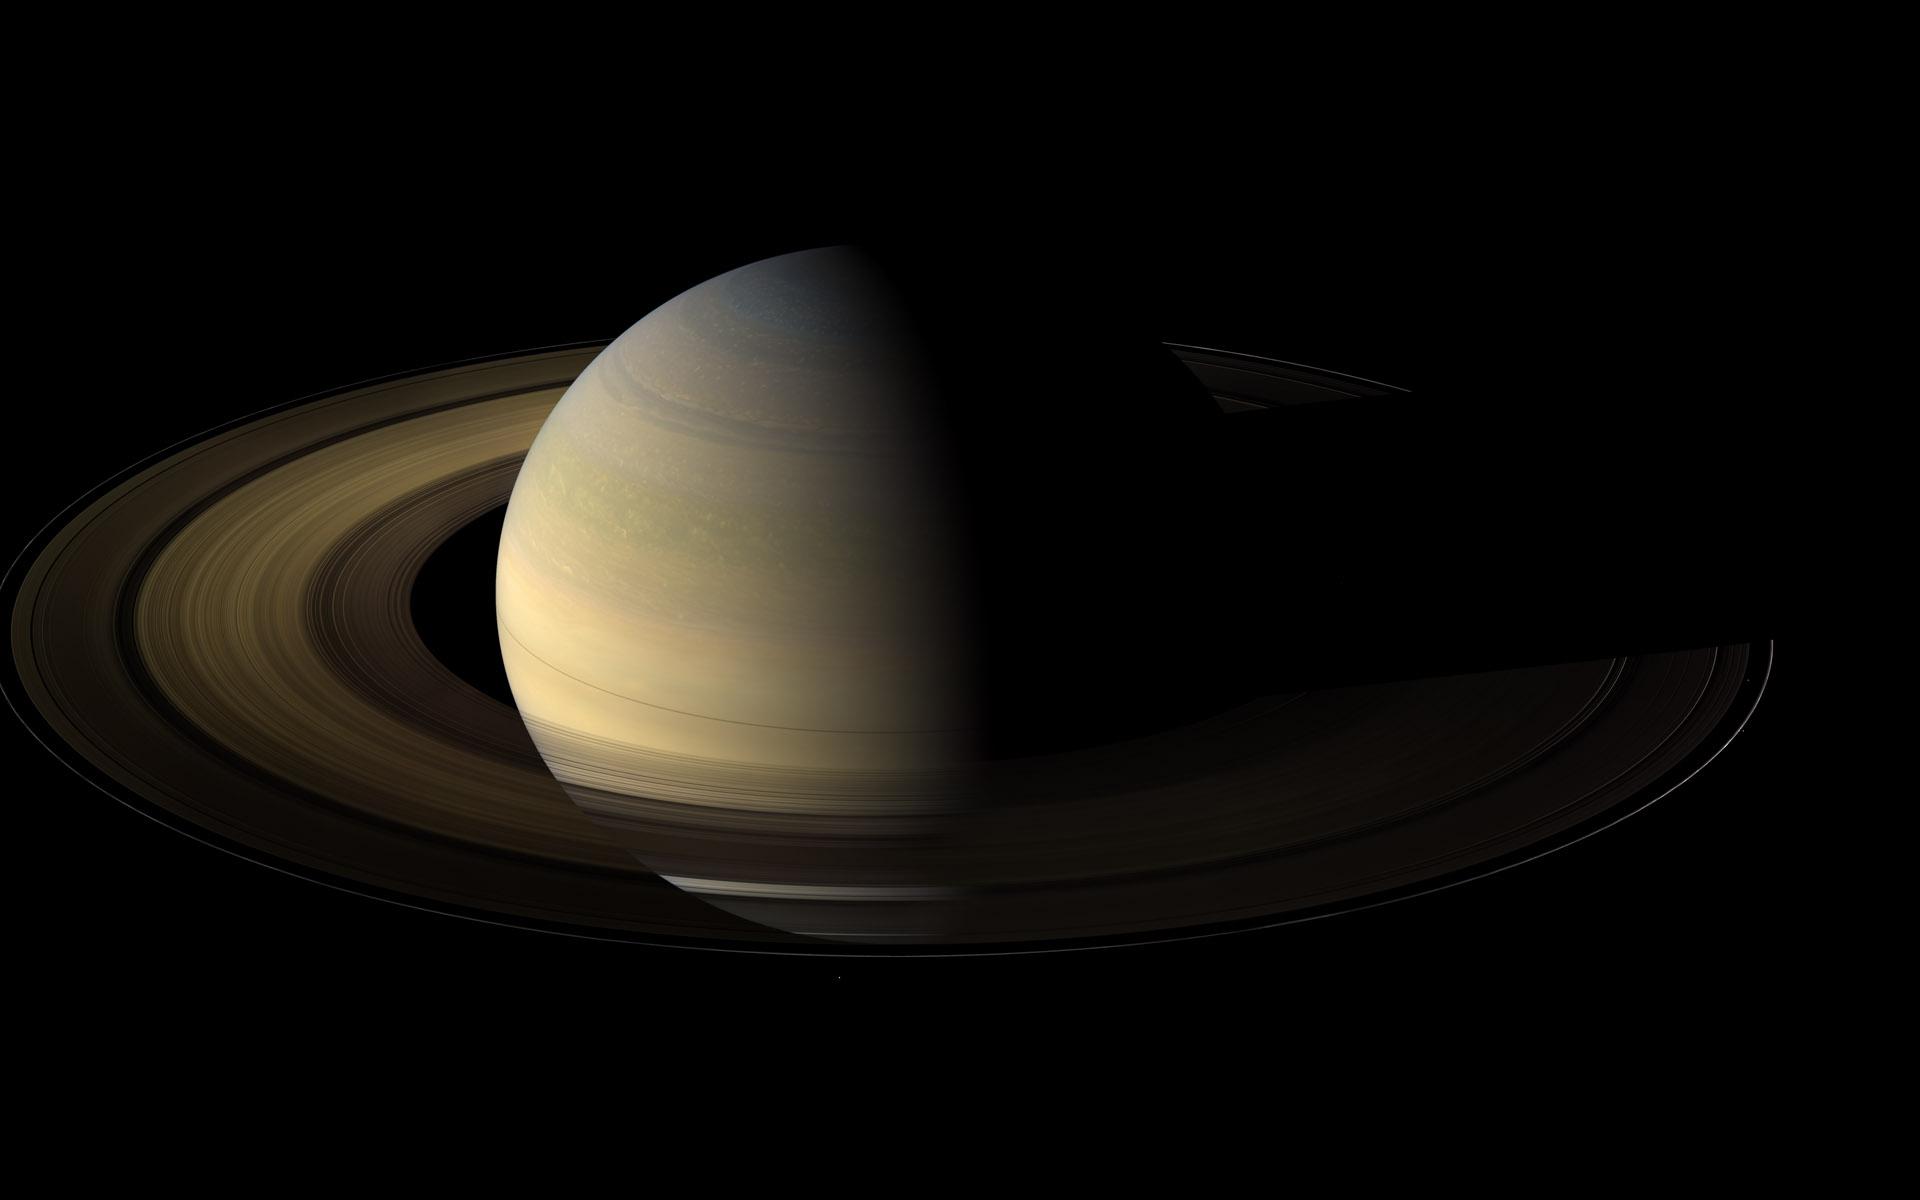 http://www.zastavki.com/pictures/1920x1200/2009/Space_Saturn_018155_.jpg